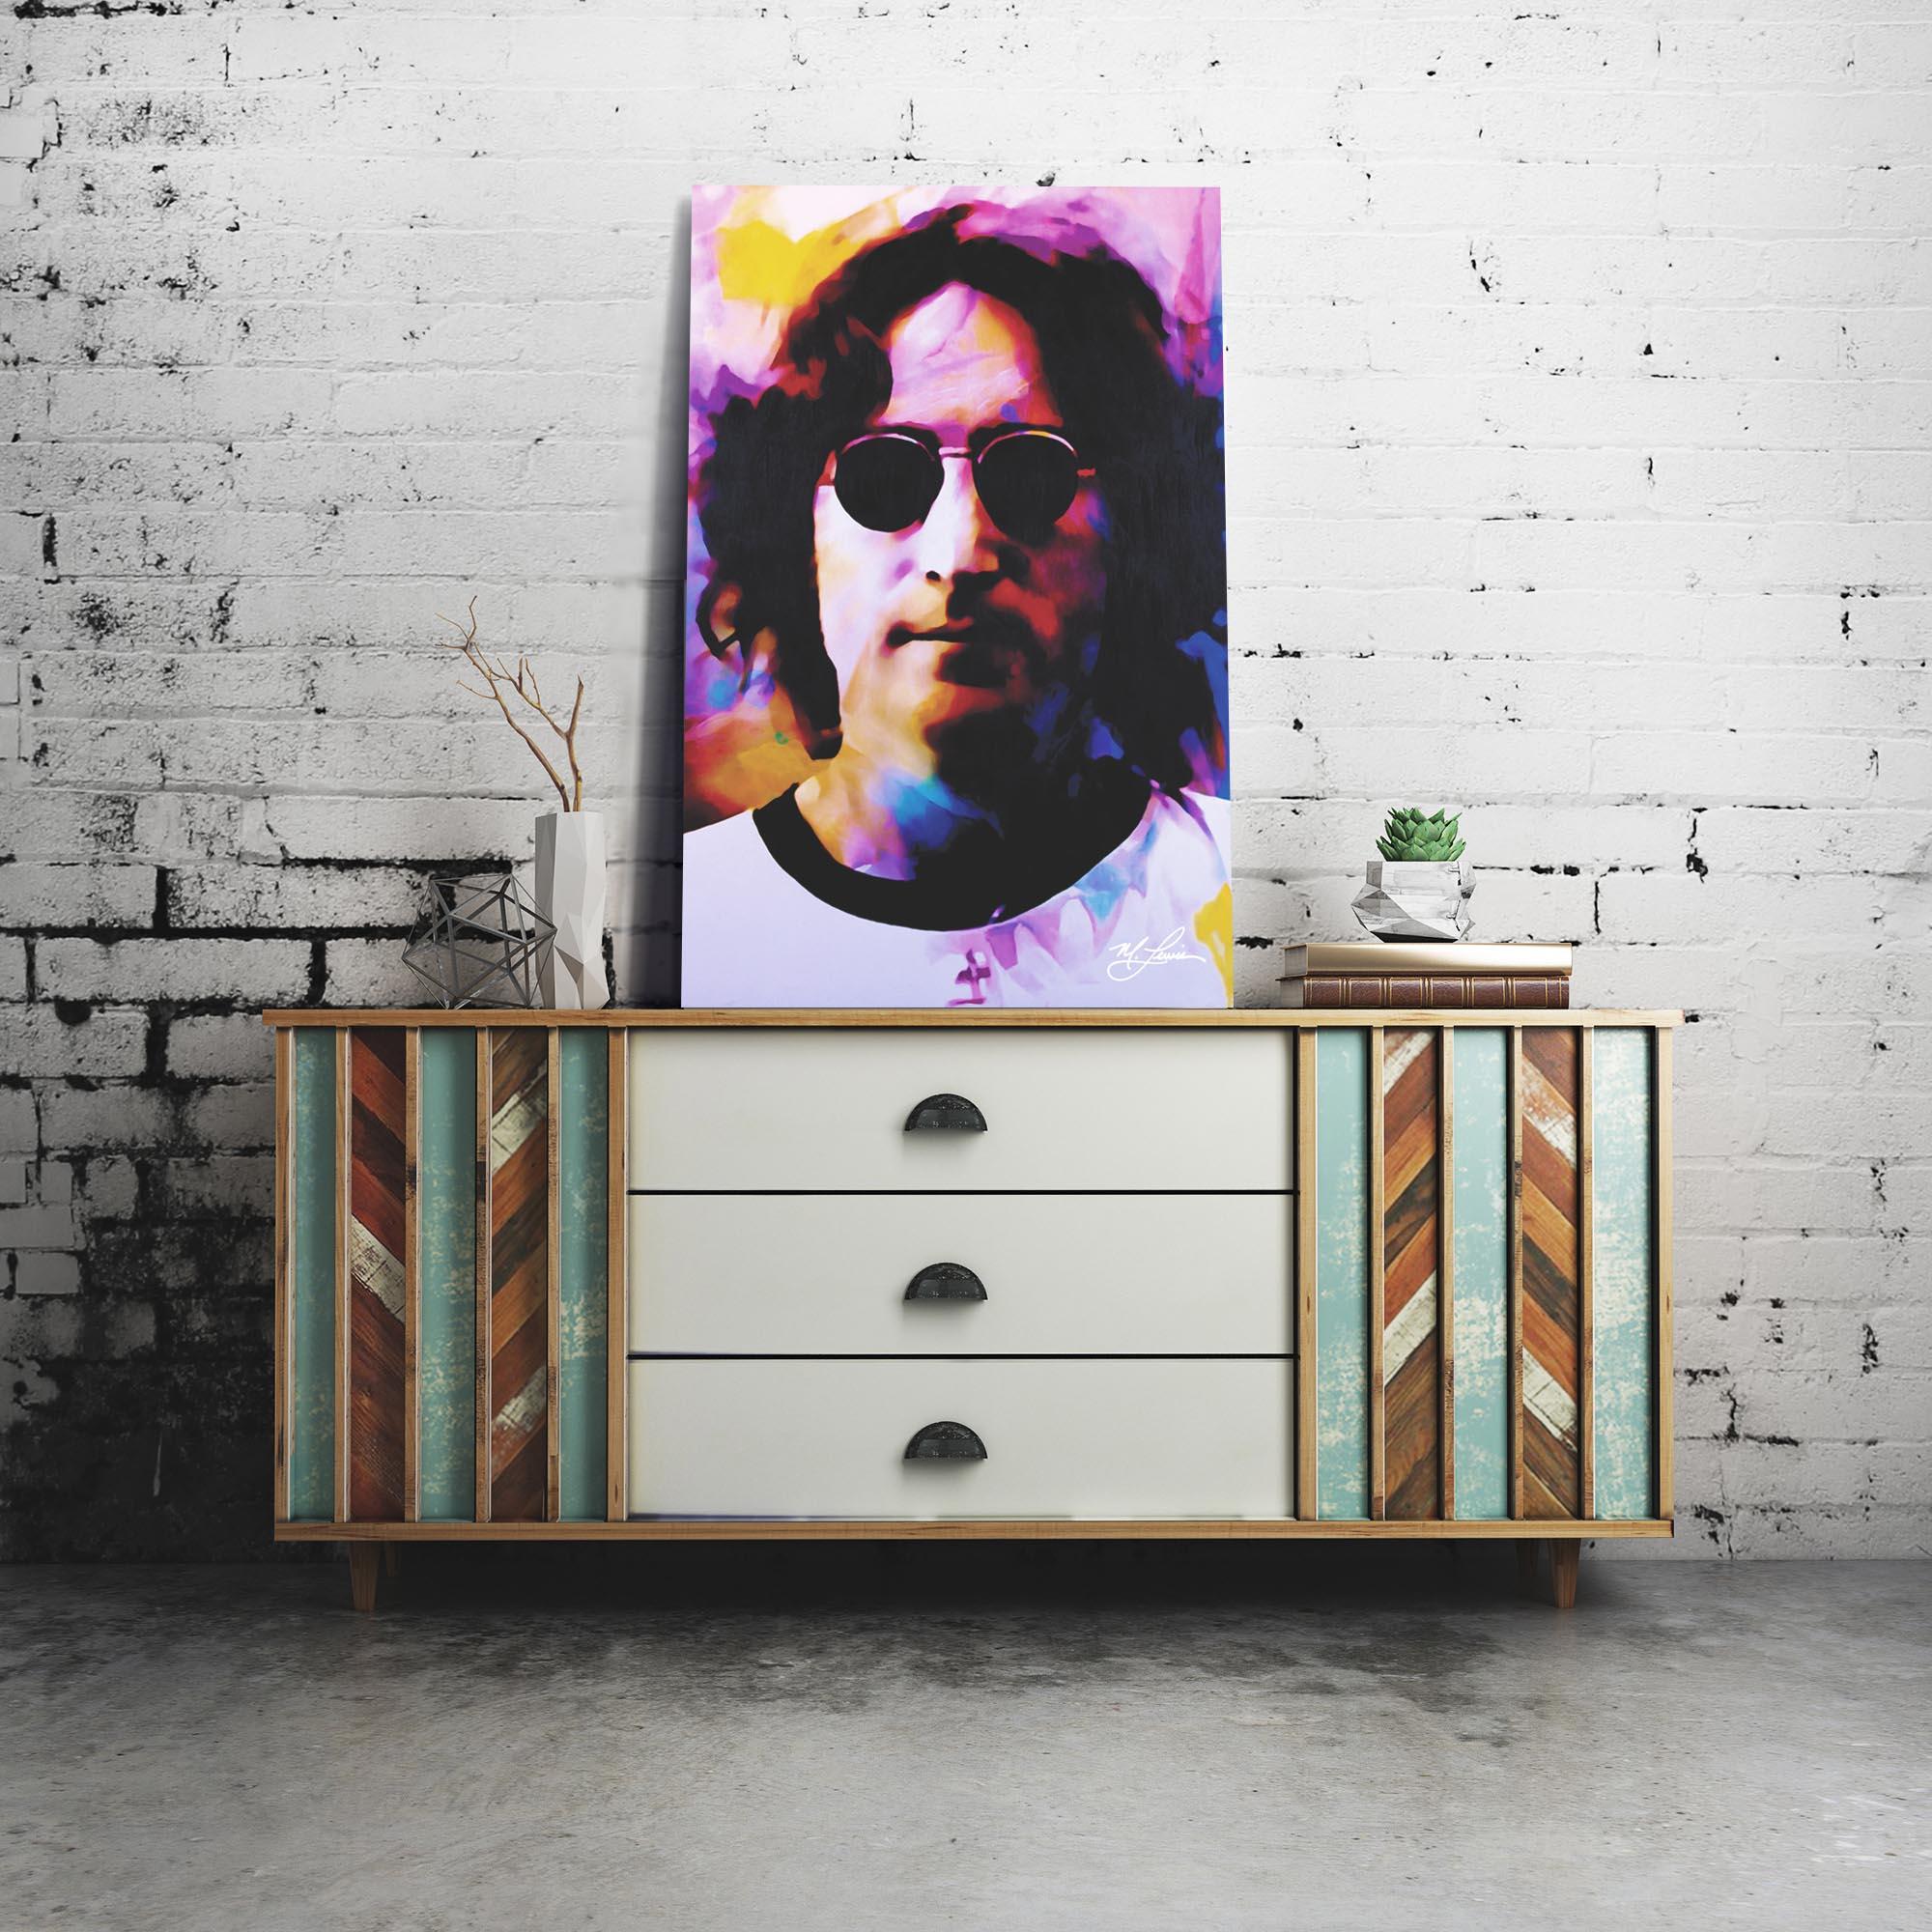 John Lennon Dance of Emotion by Mark Lewis - Celebrity Pop Art on Metal or Plexiglass - ML0037